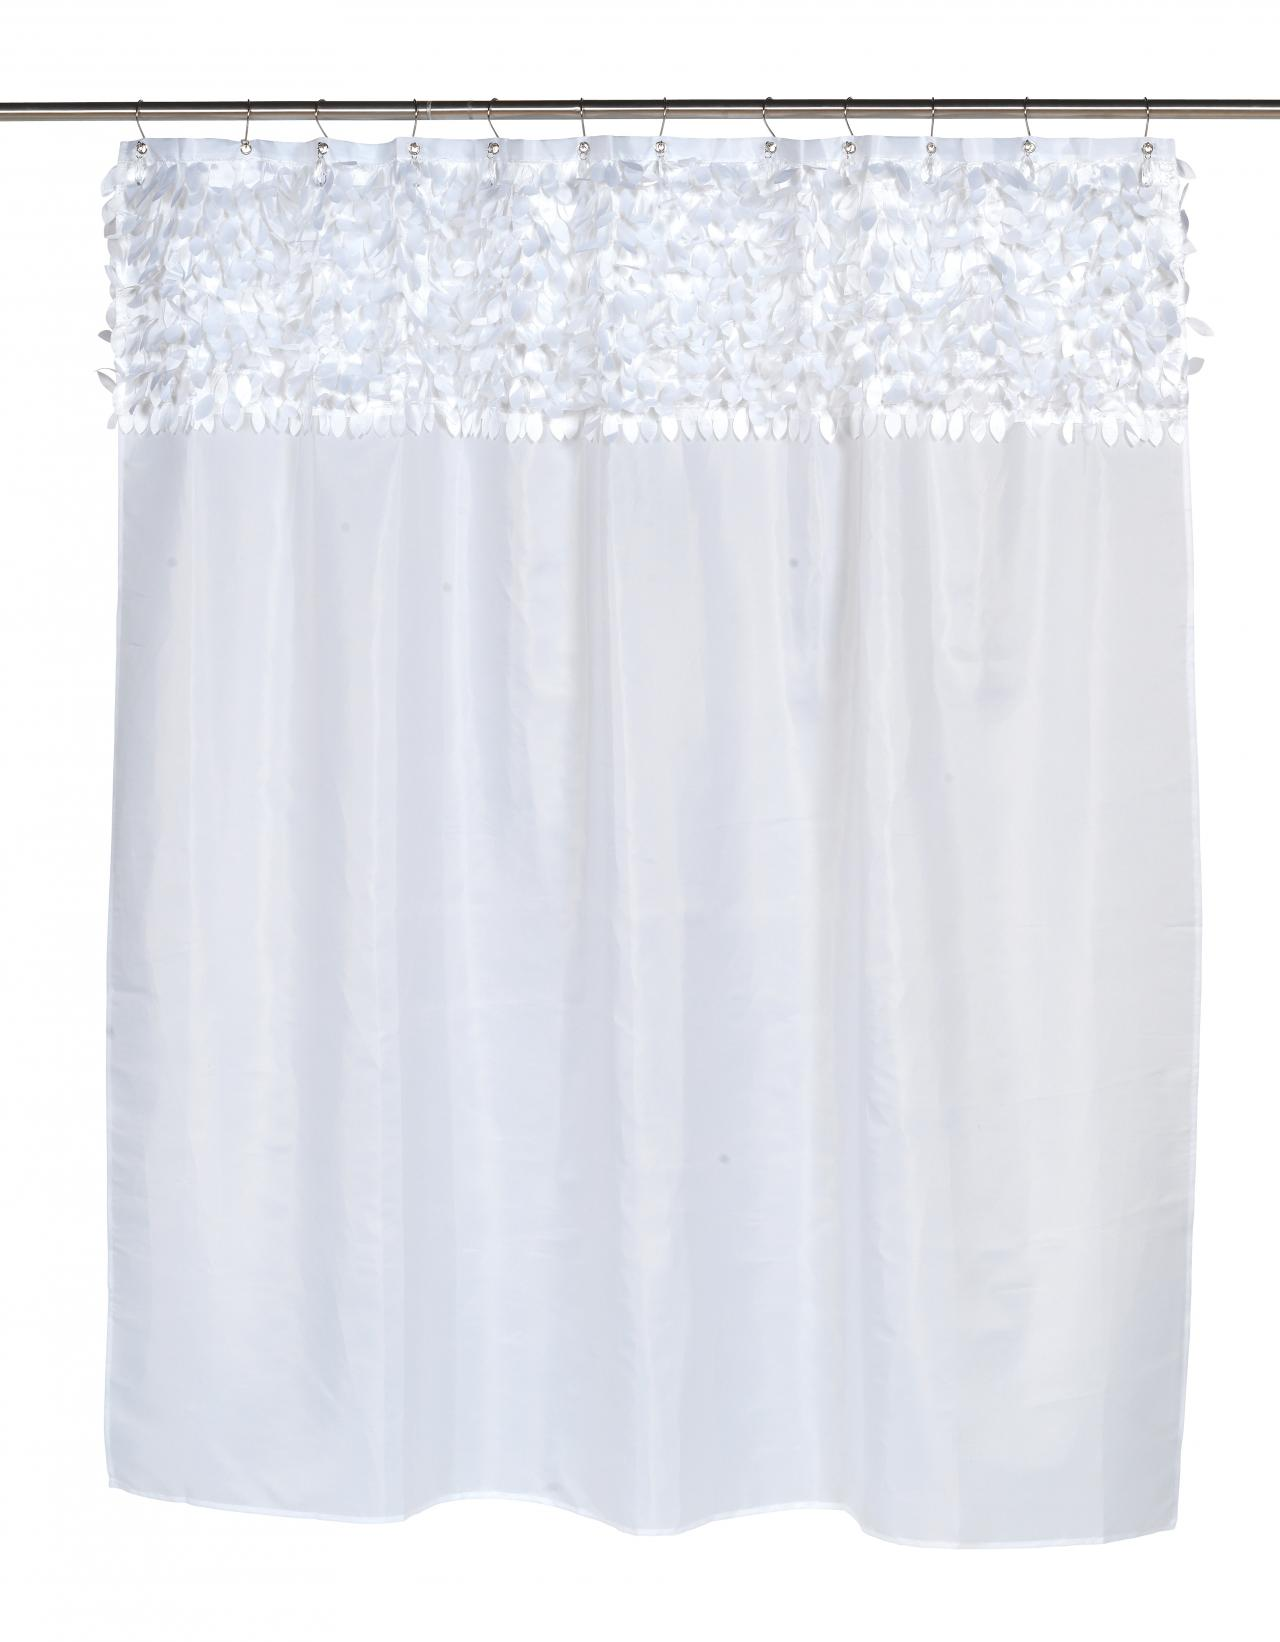 Carnation Home Fashions Inc Jasmine Fabric Shower Curtains